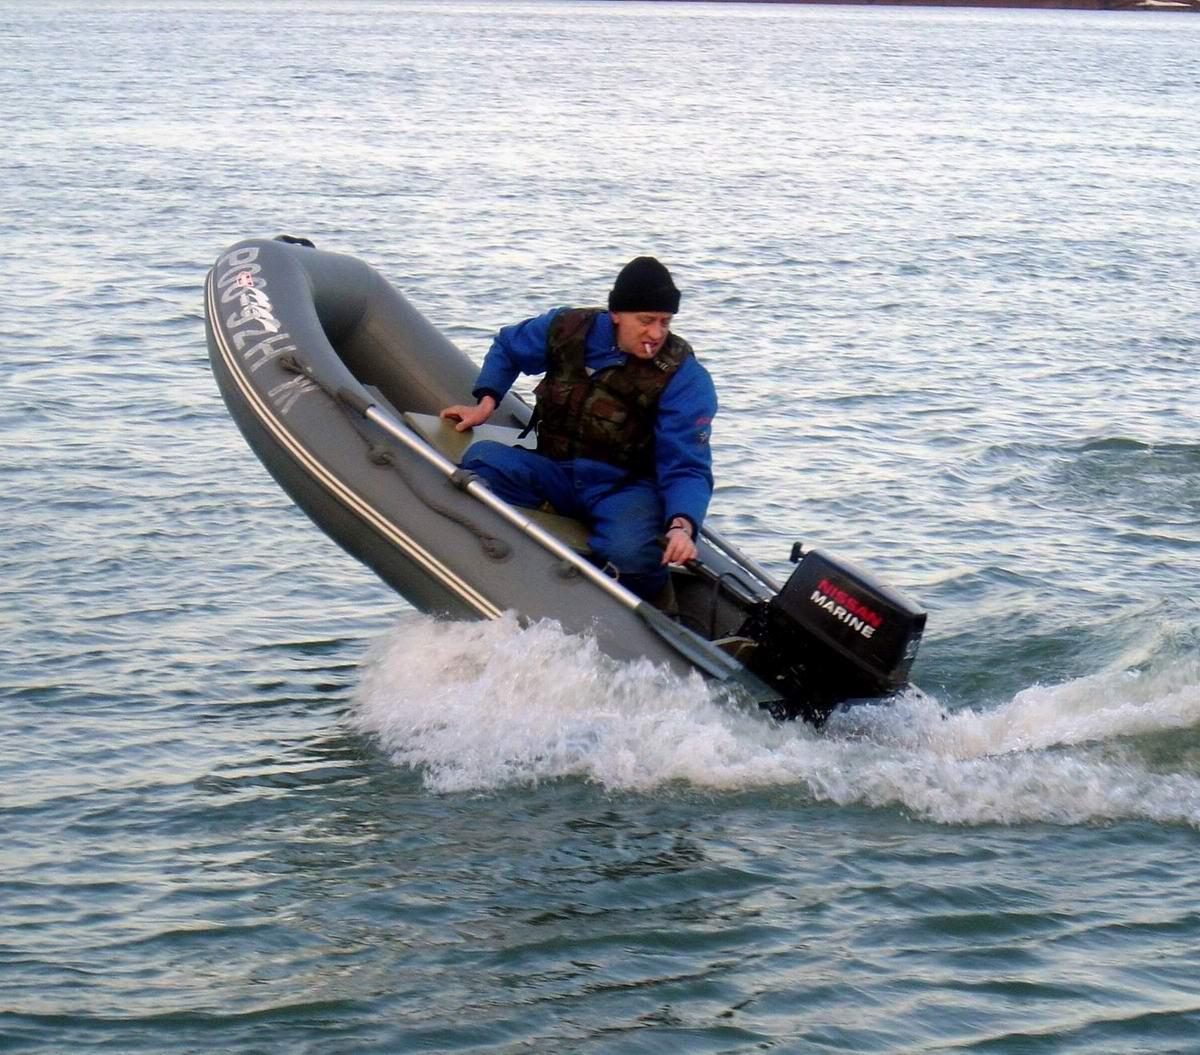 Река Обь. Лодка Кайман-285. Каряк (Алексей) стартует на рыбалку. Автор P.Ch (Петр).